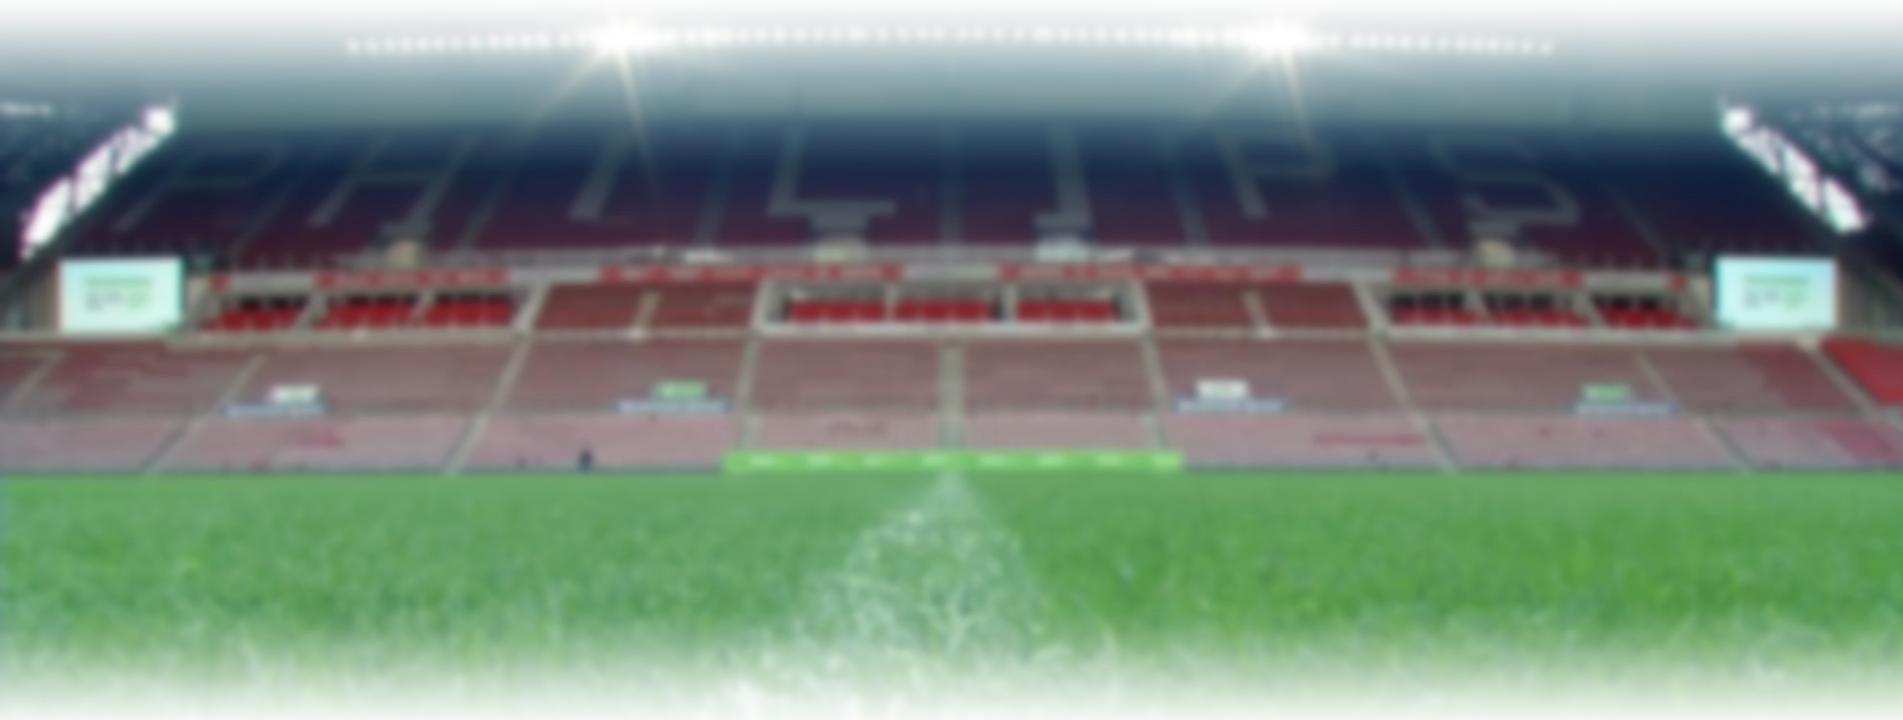 PSV Sliderfoto 2018-2019